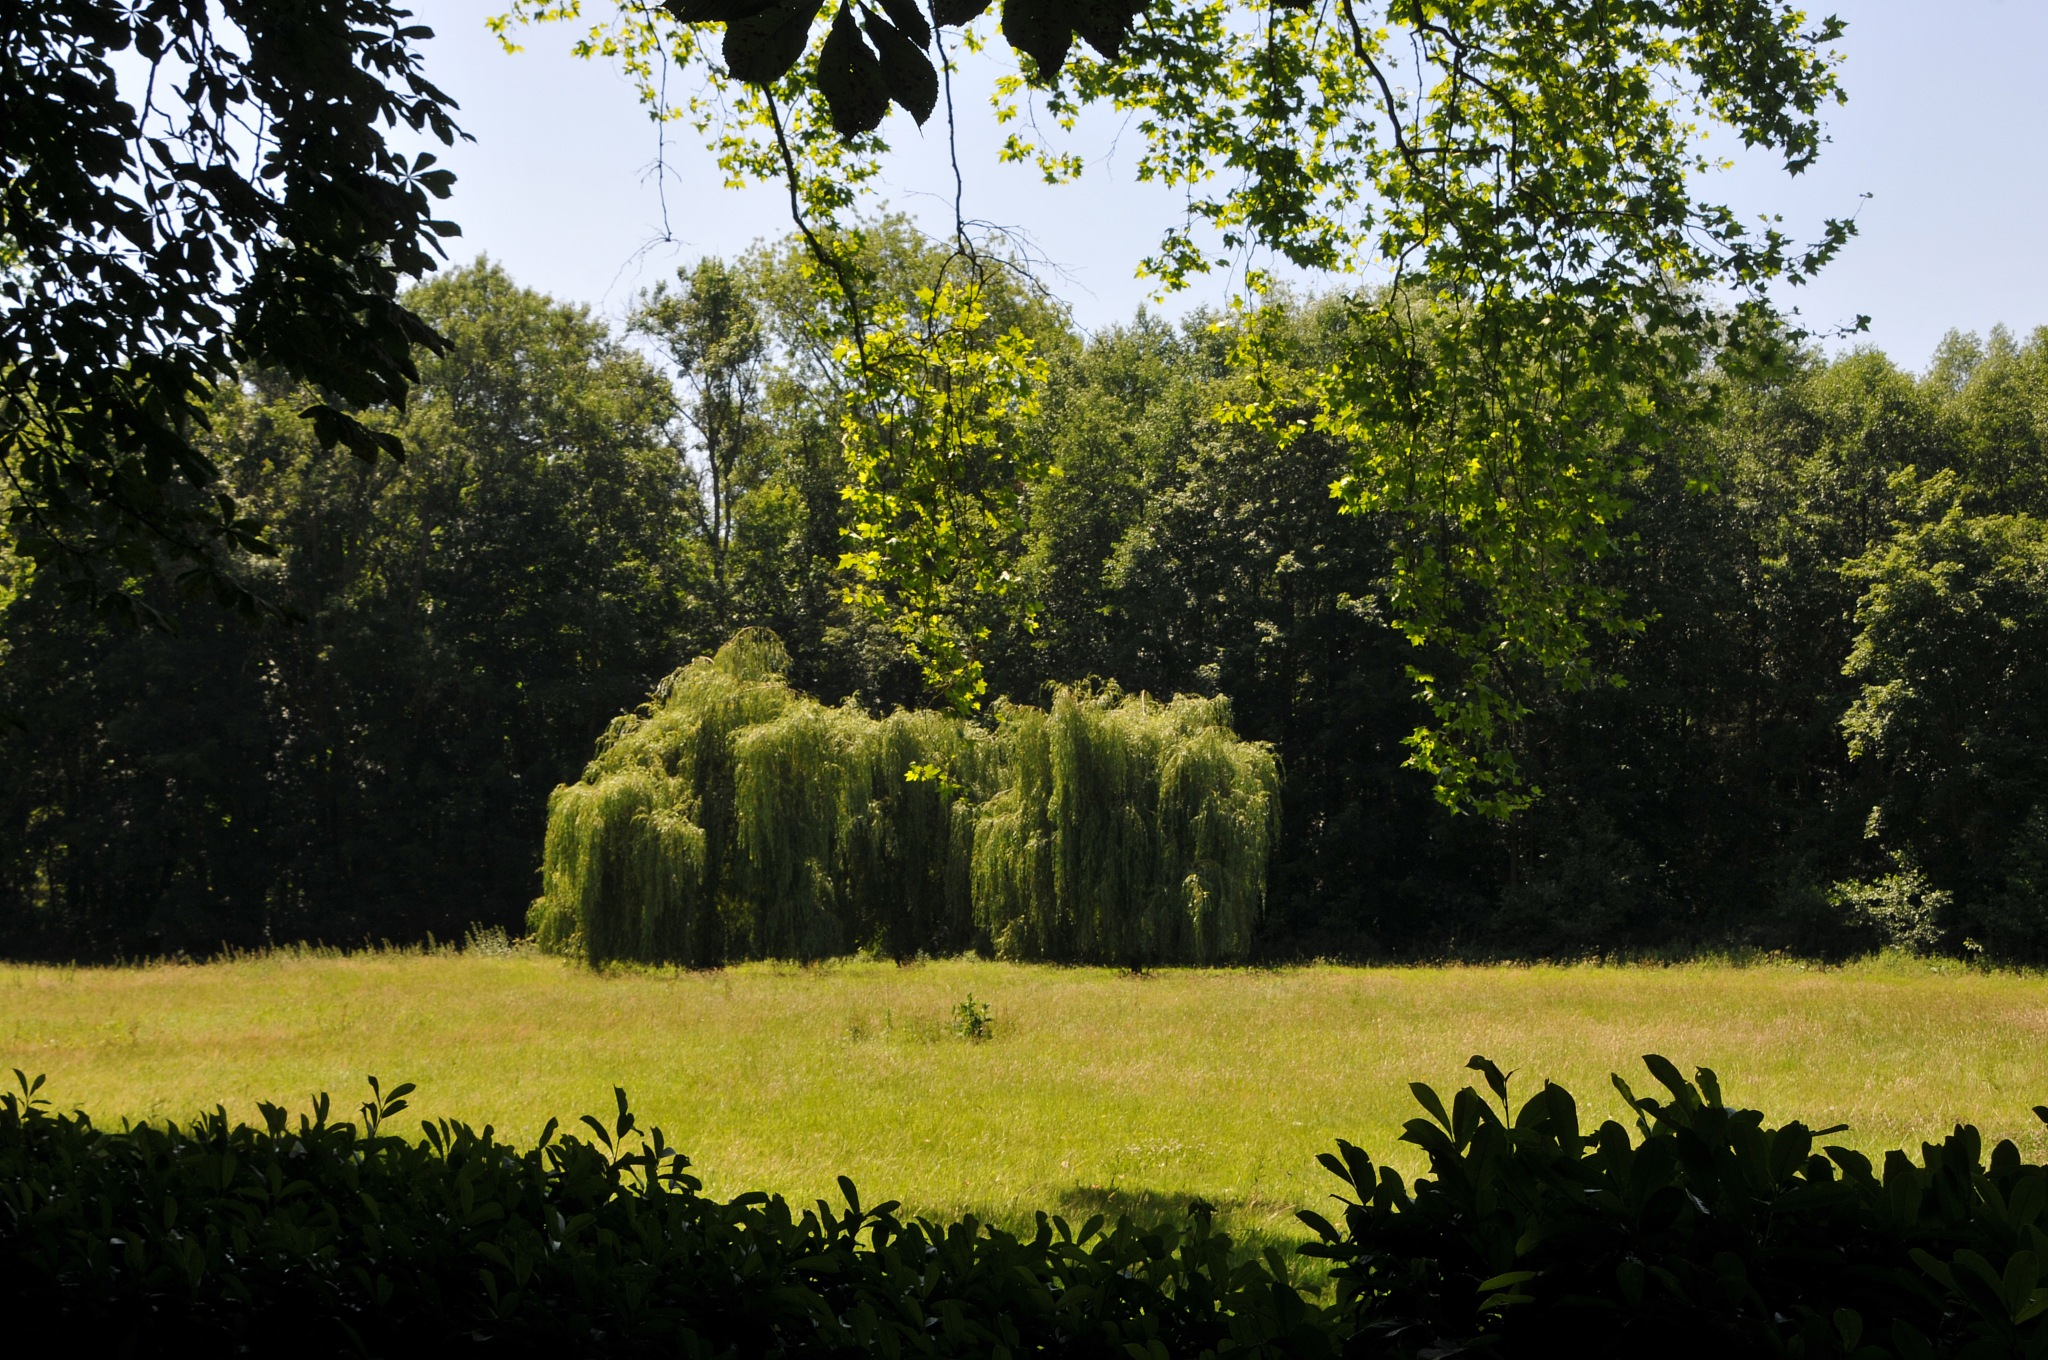 Le Grand Jardin by JeanGregoireMarin